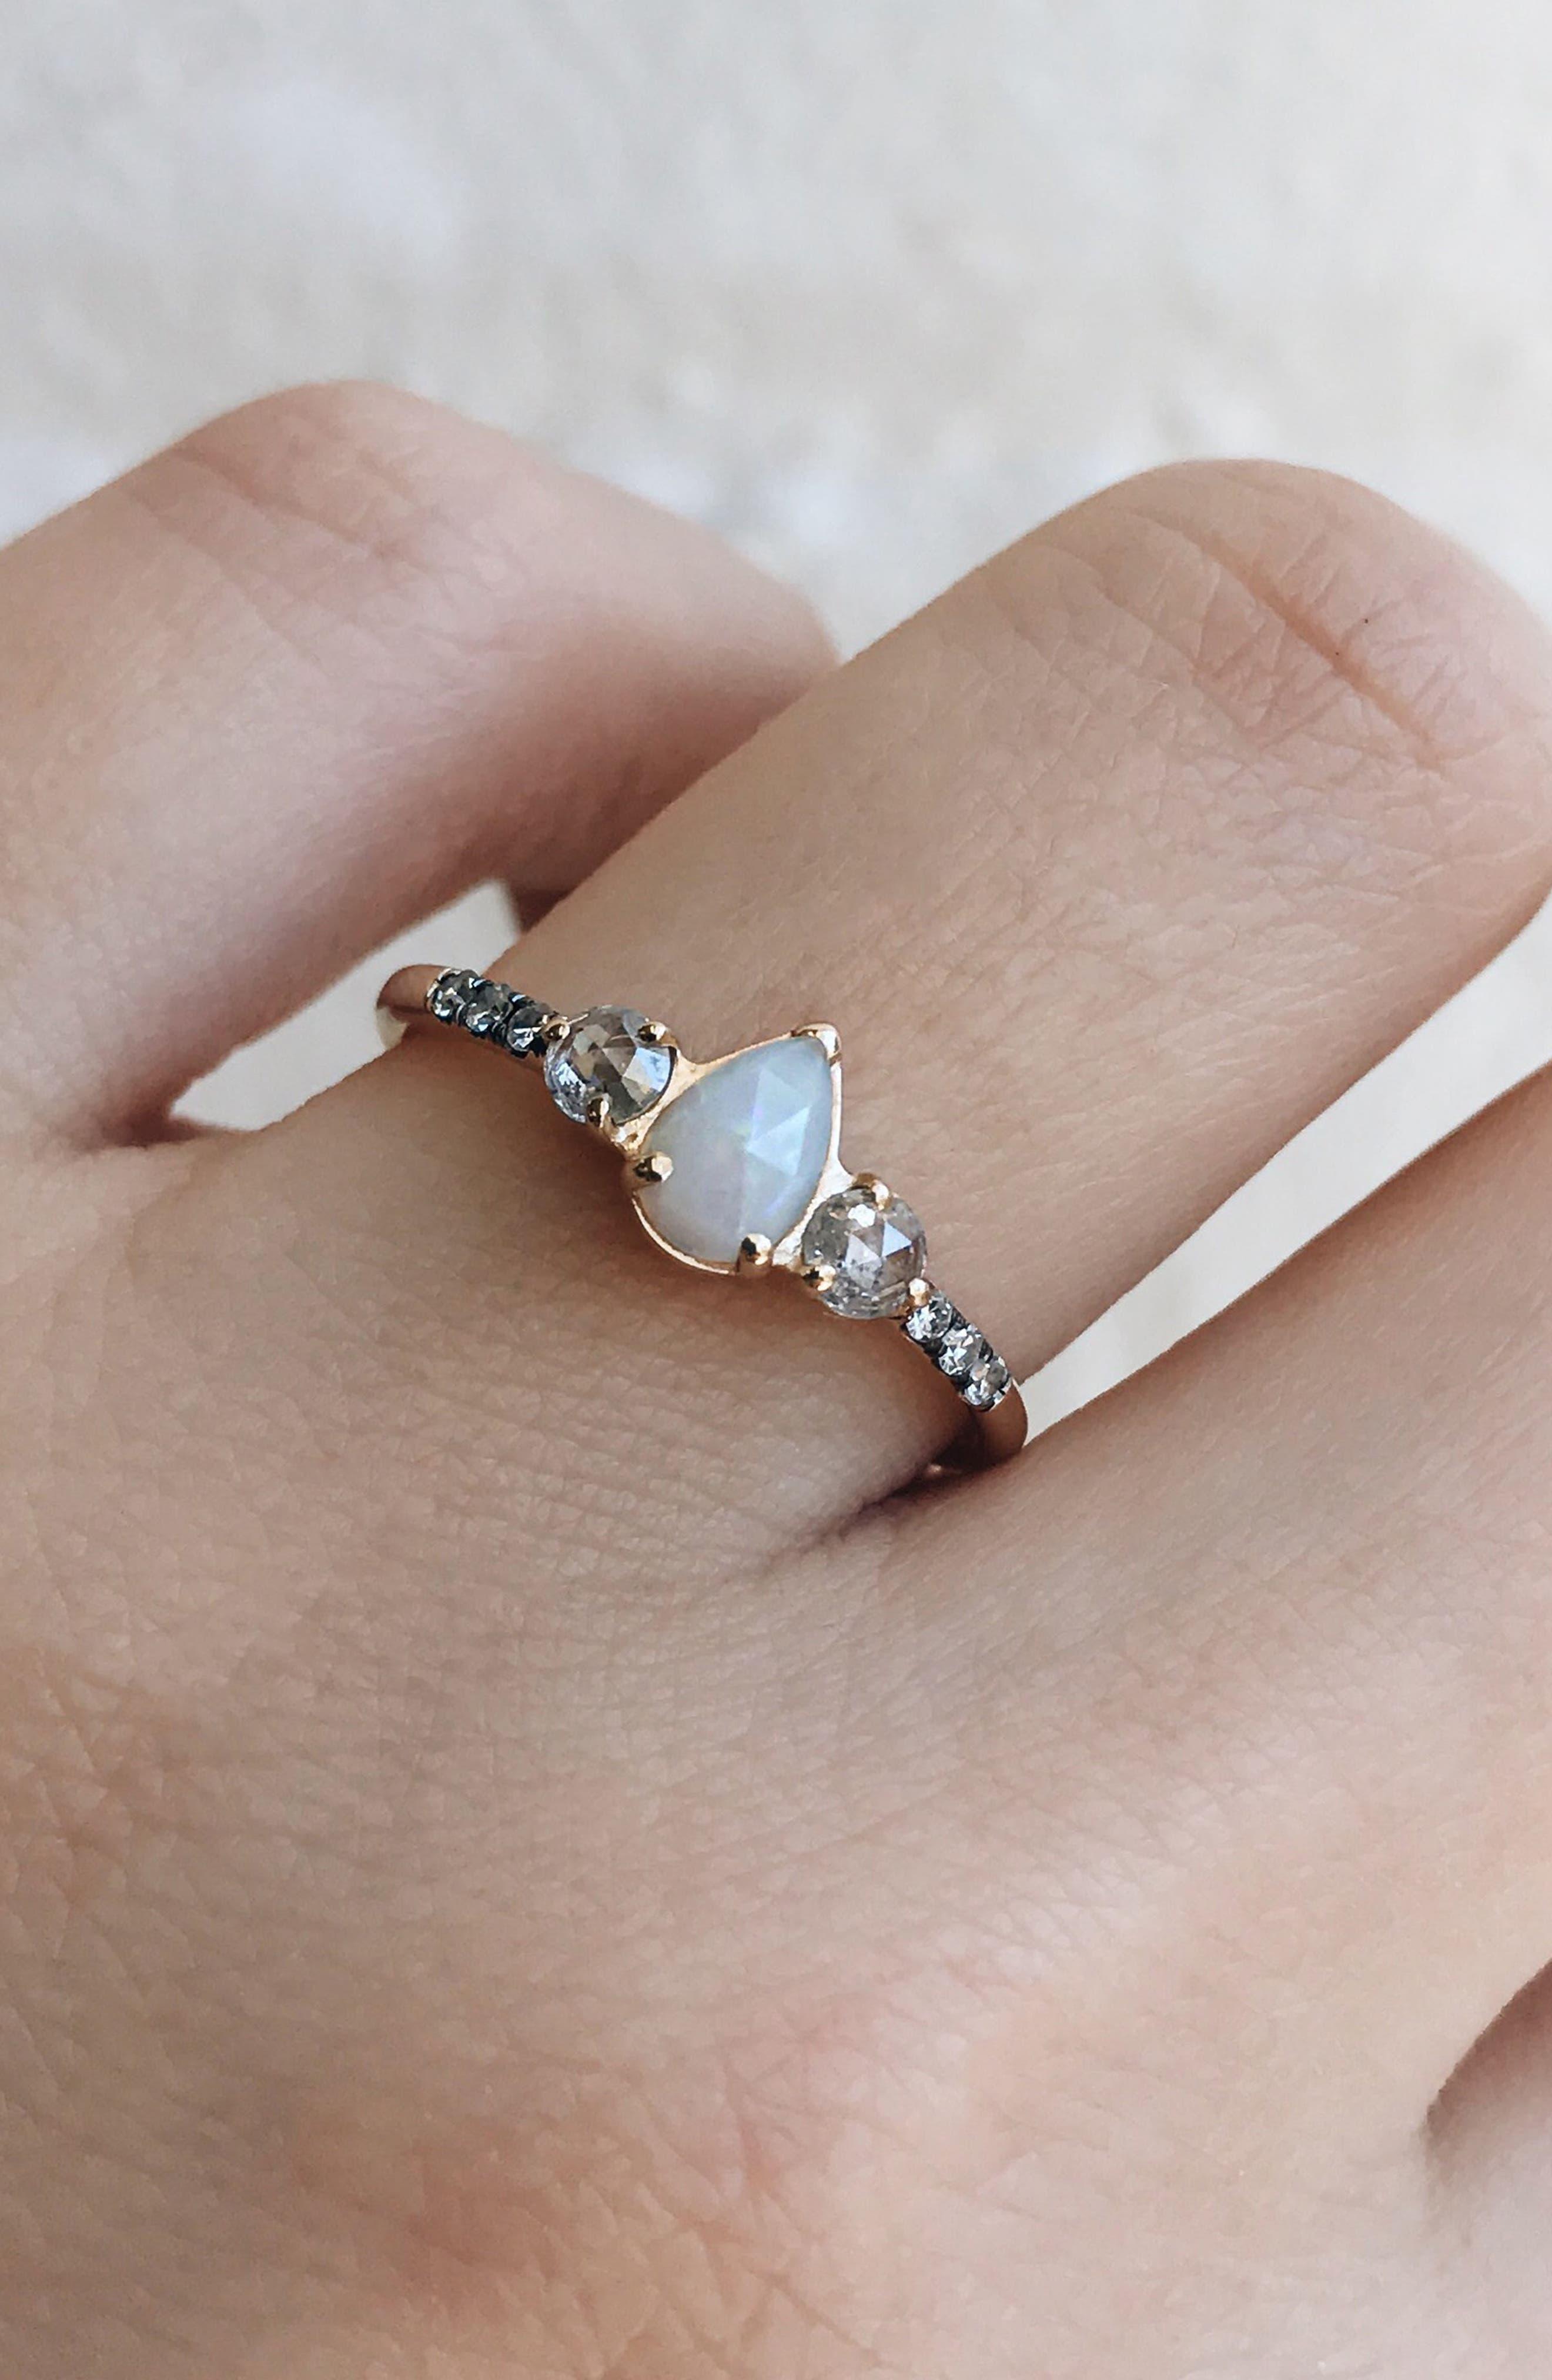 Radiance Opal & Diamond Ring,                             Alternate thumbnail 4, color,                             WHITE GOLD/ OPAL